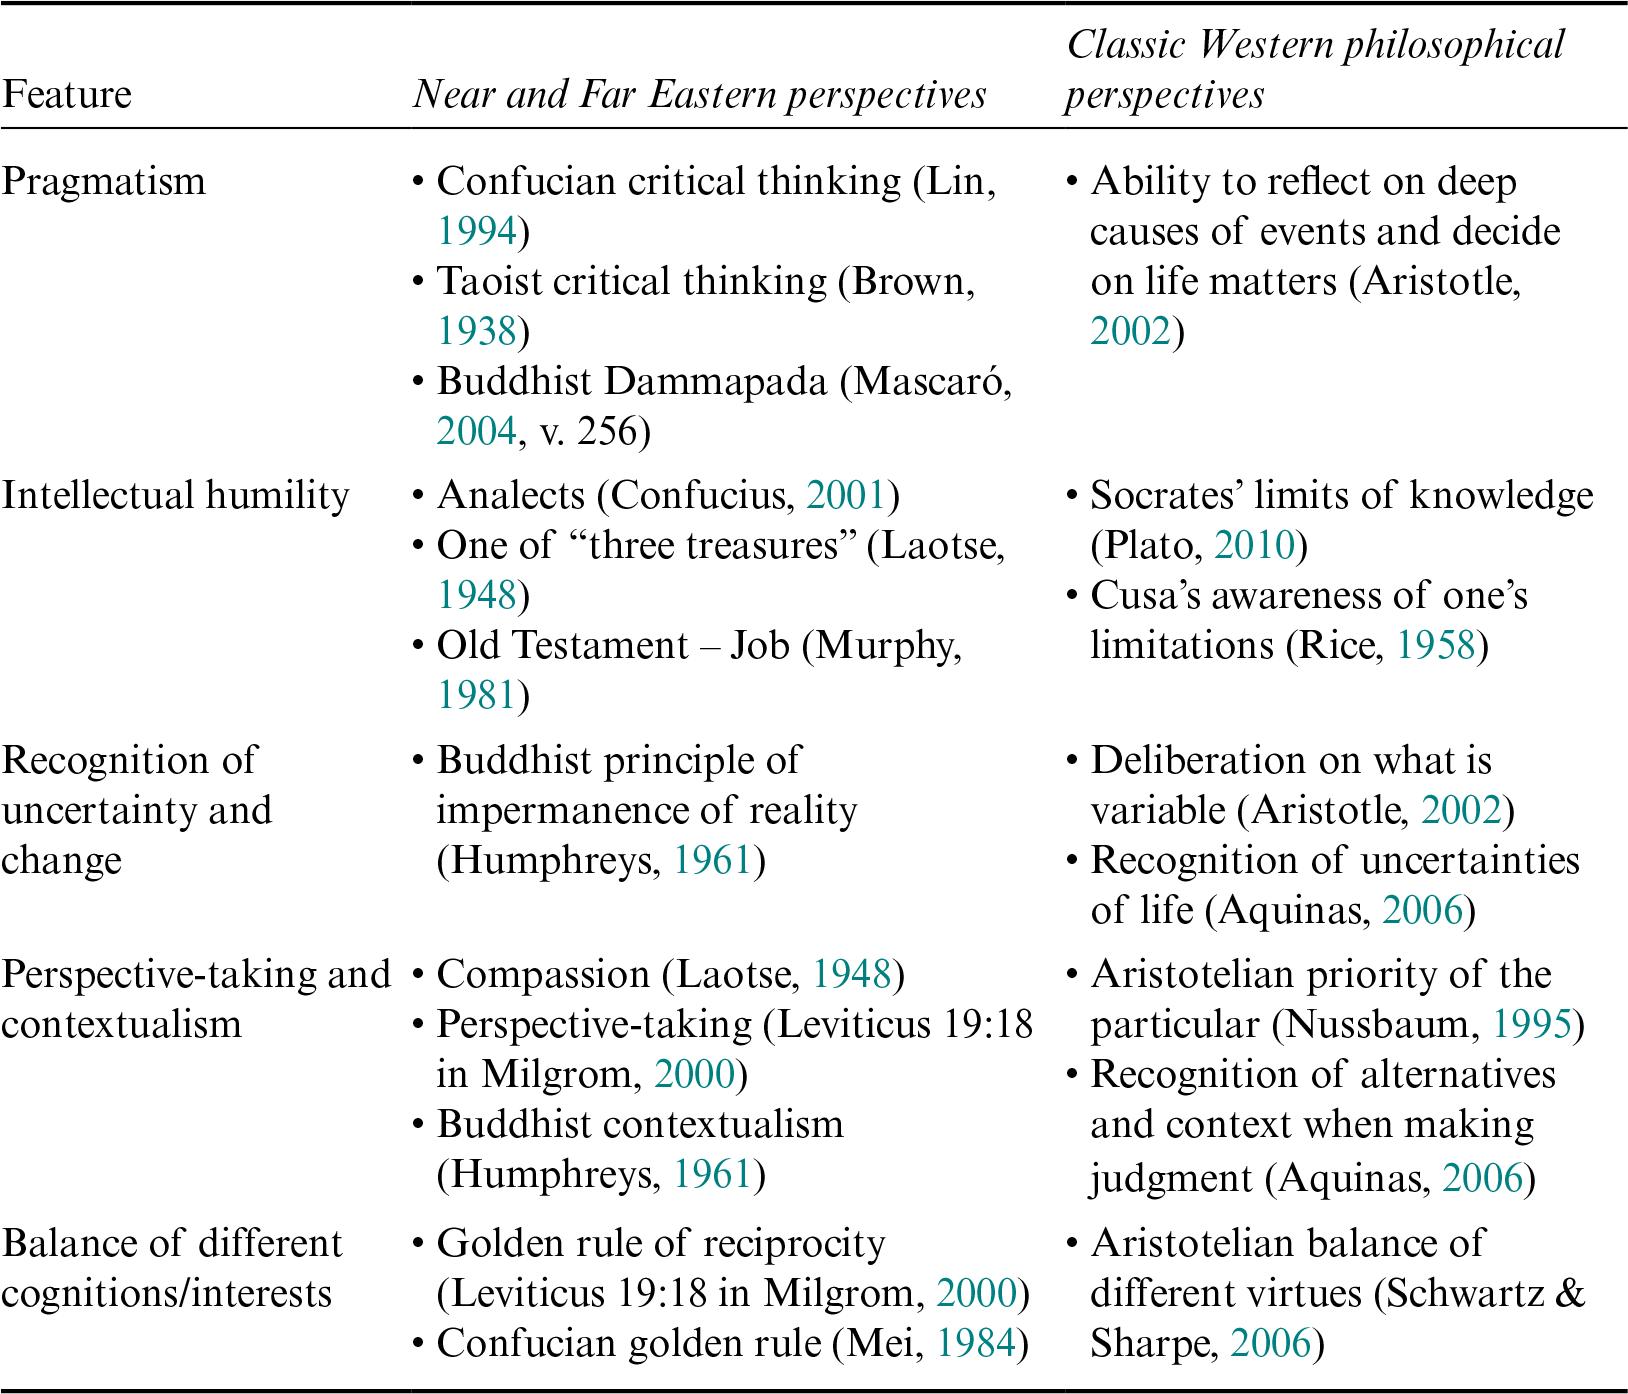 Conceptions of Wisdom (Part II) - The Cambridge Handbook of